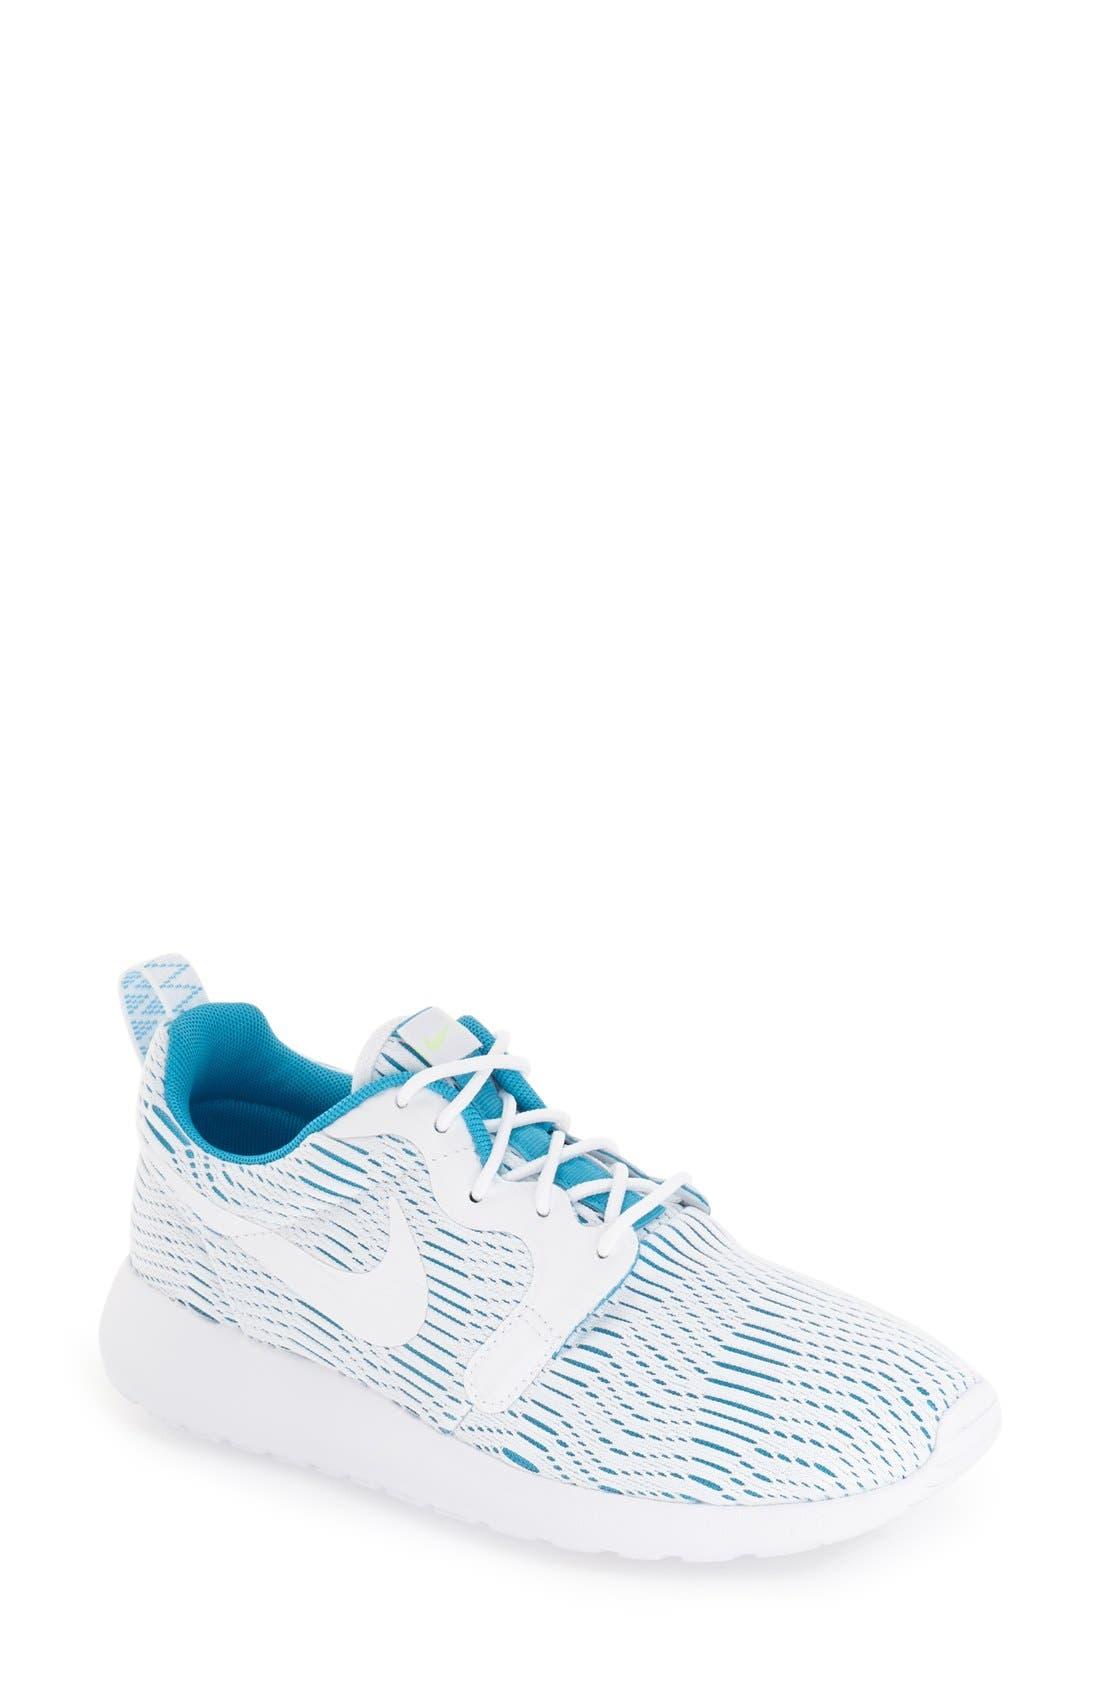 Main Image - Nike 'Roshe Run' Print Sneaker (Women)